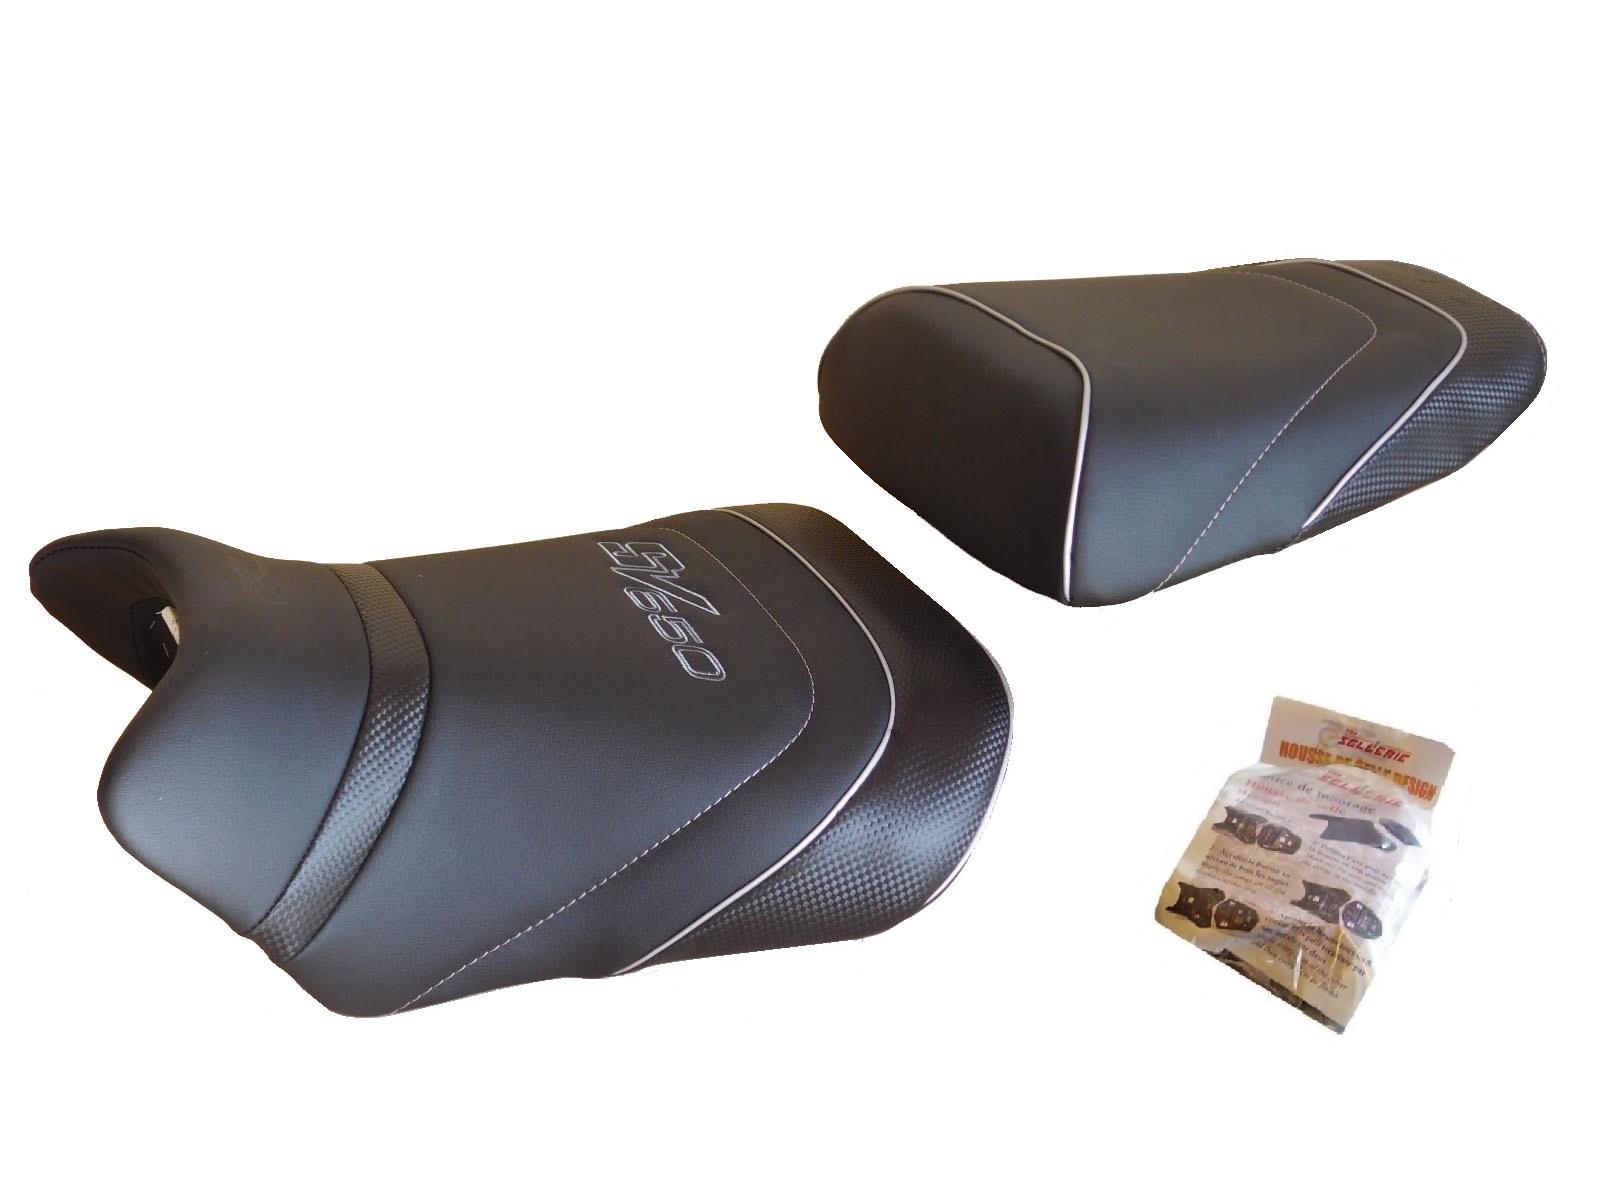 housse de selle design hsd4357 suzuki sv 650 s n 2006 2012 tarifs pour france. Black Bedroom Furniture Sets. Home Design Ideas